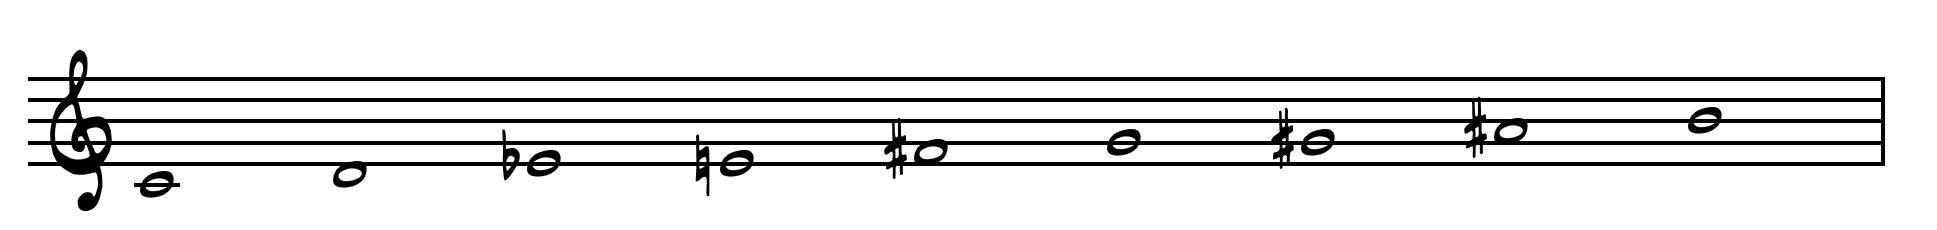 Messiaen3a